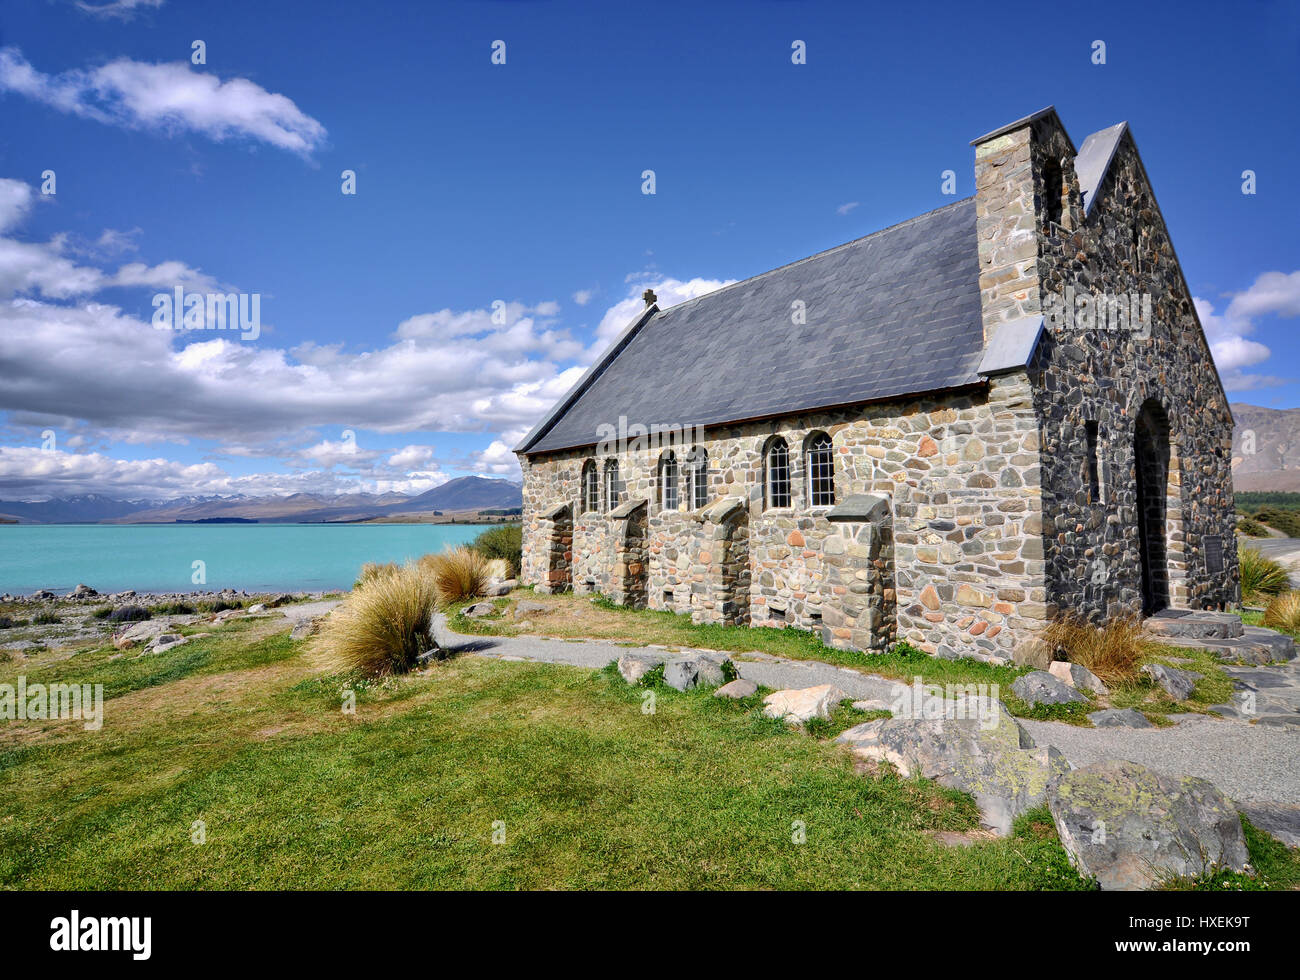 Church of the Good Shepherd, Lake Tekapo, New Zealand - Stock Image